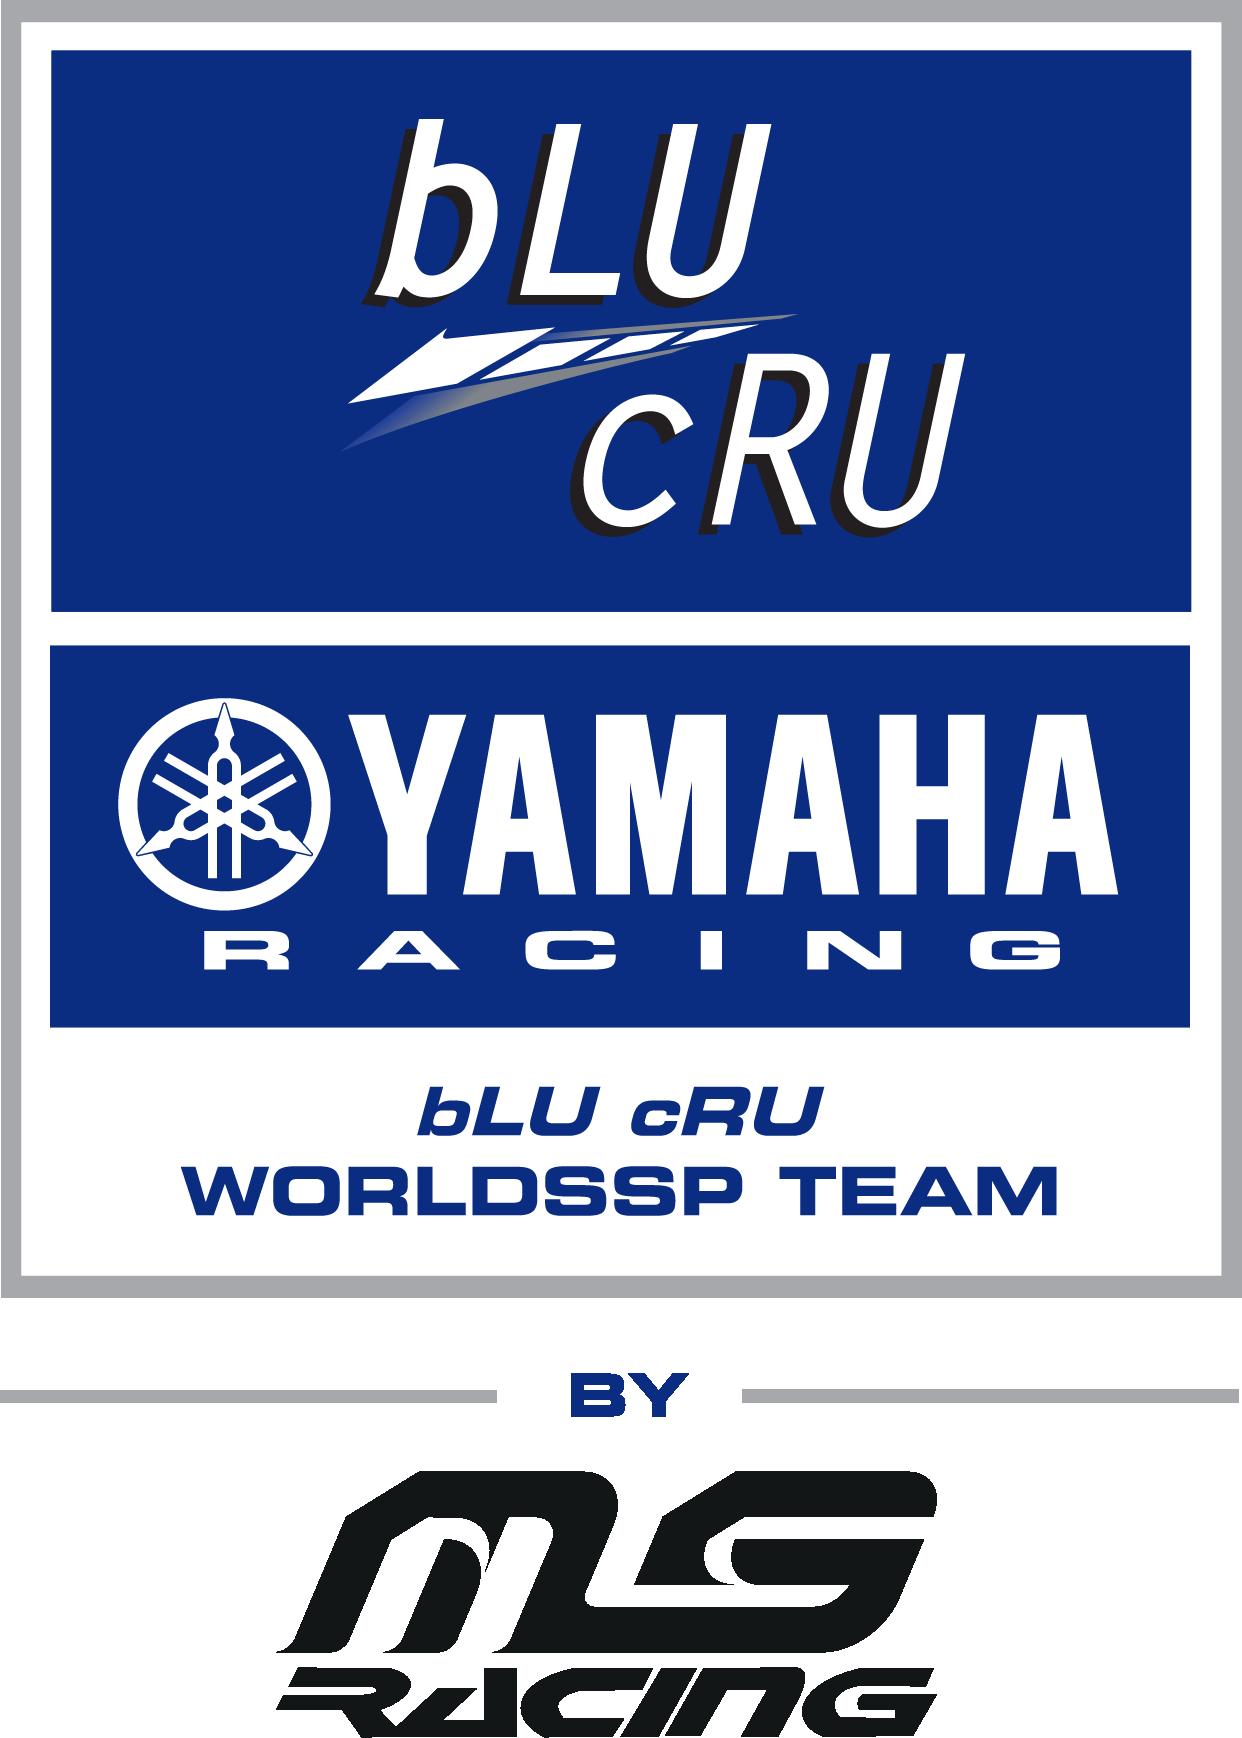 YAMAHA MS Racing - WSBK - Equipo de competición